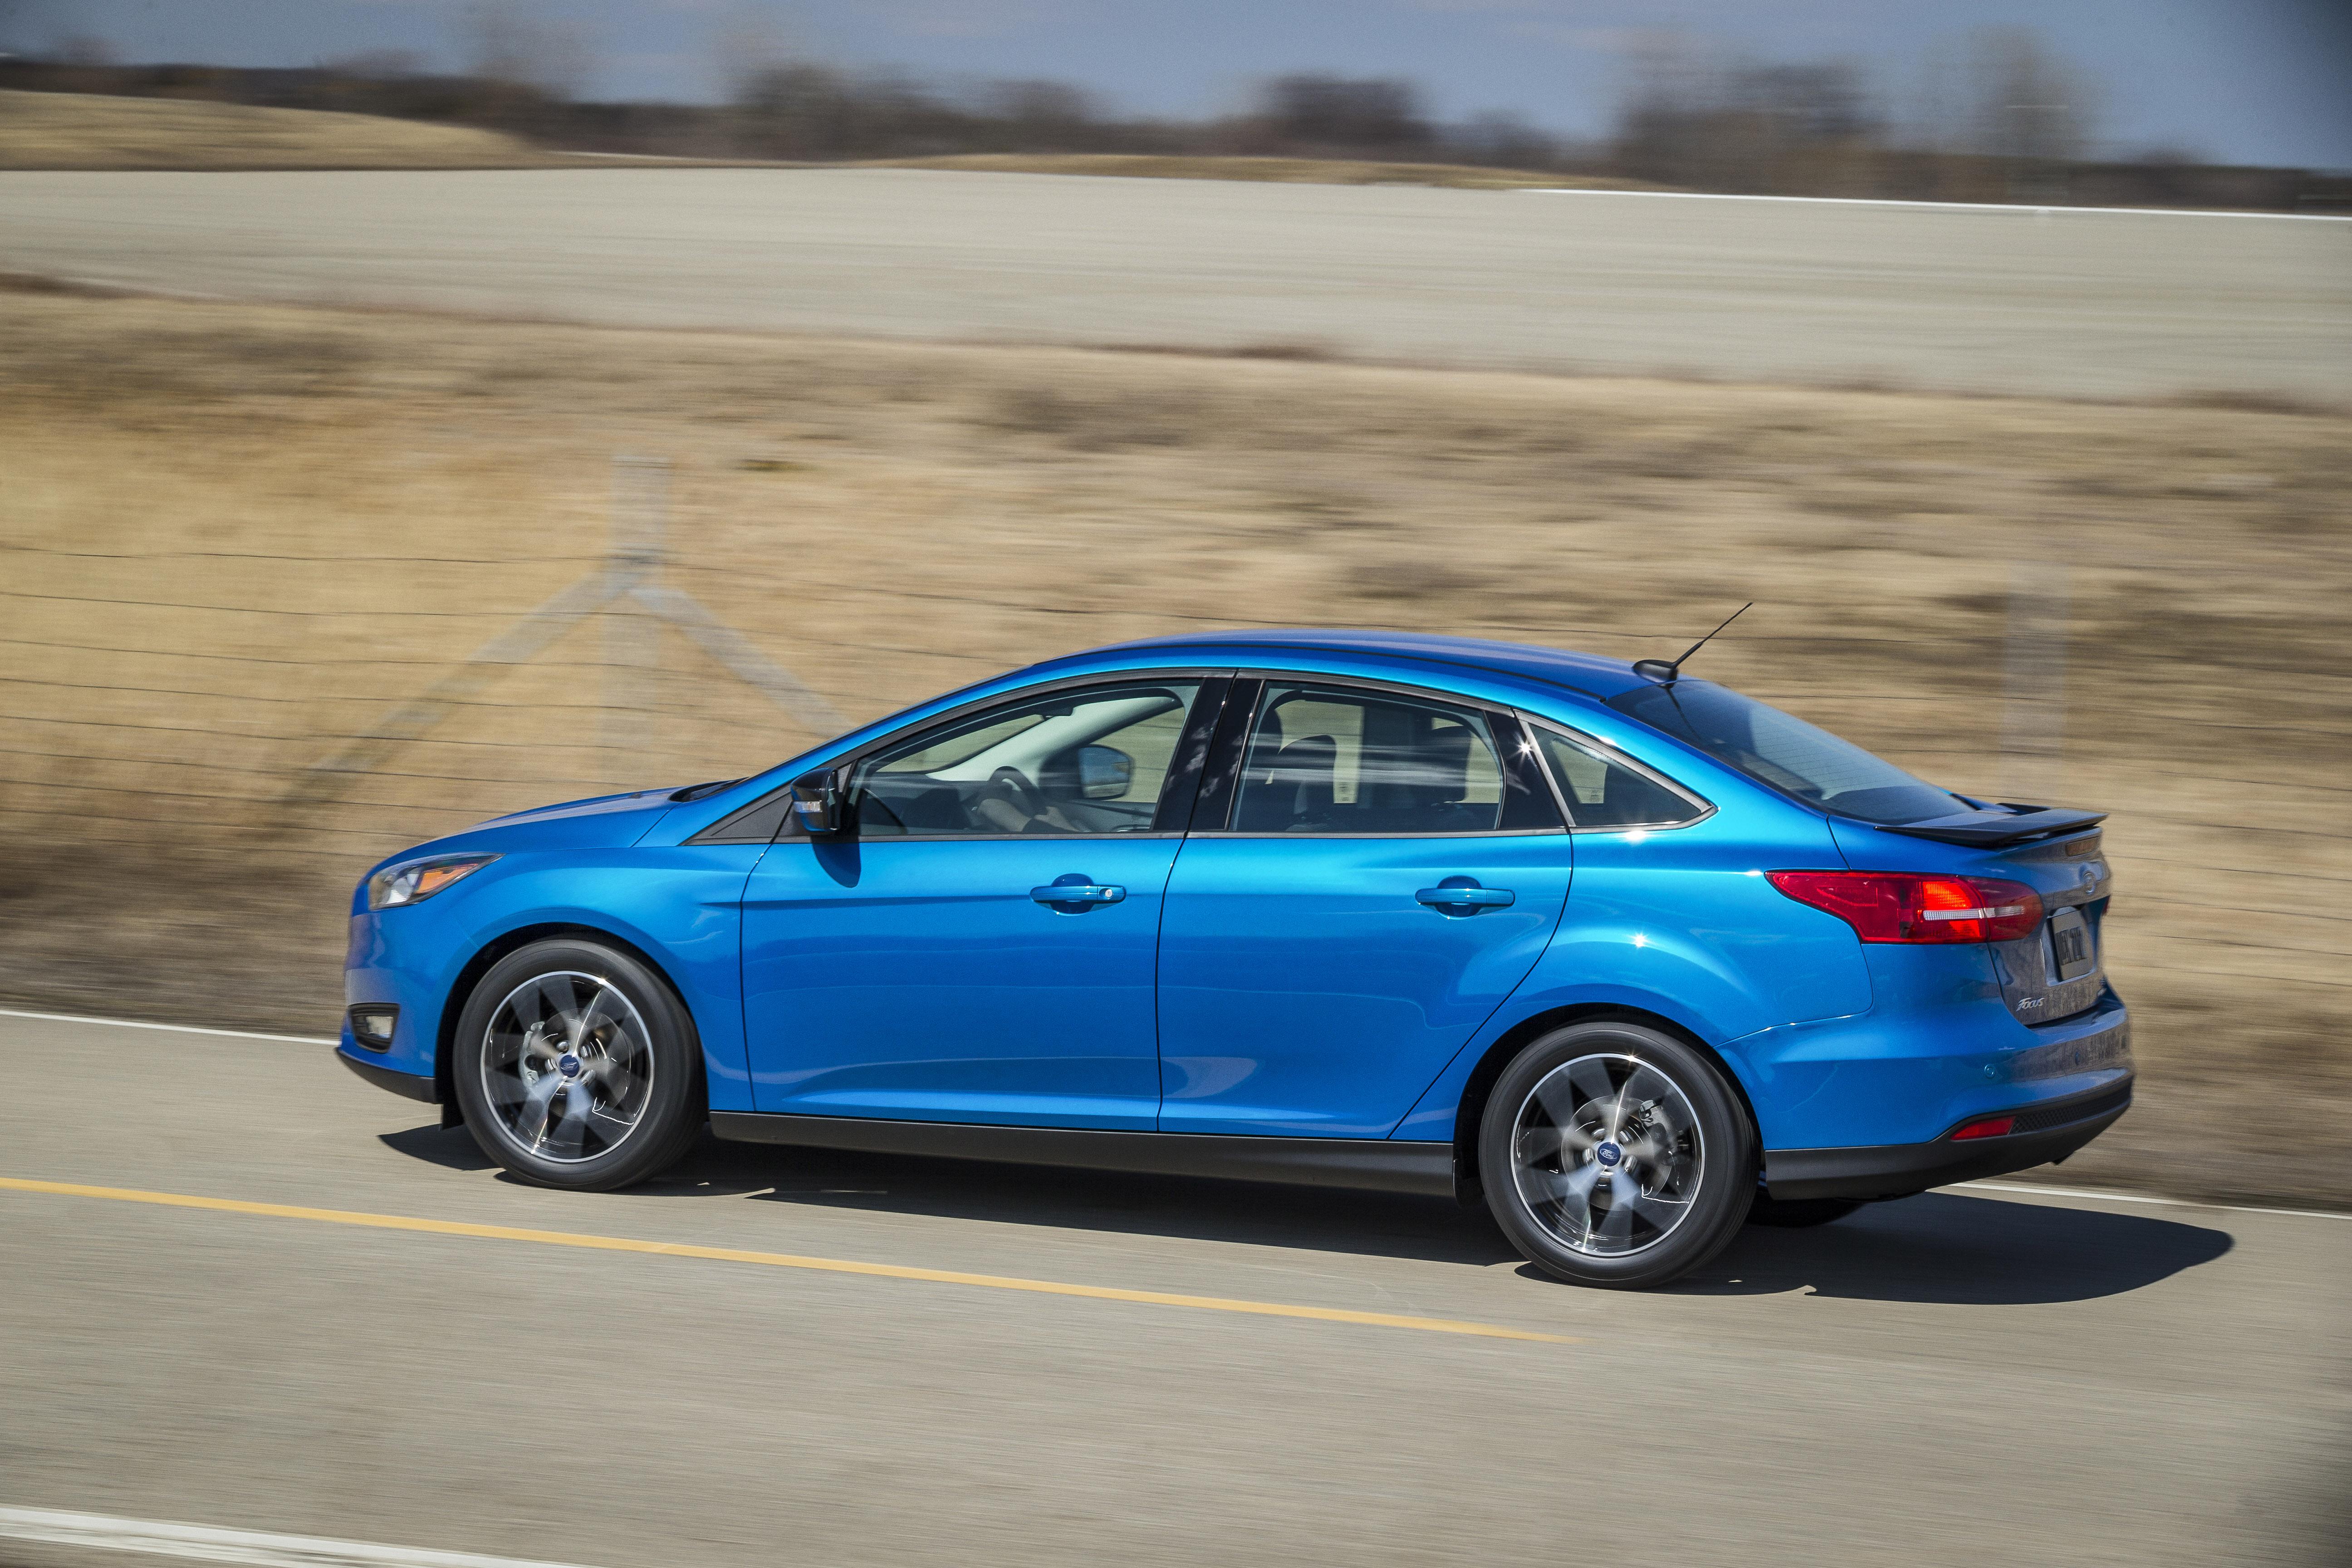 Каталог - Детали кузова - Бампер Ford Focus